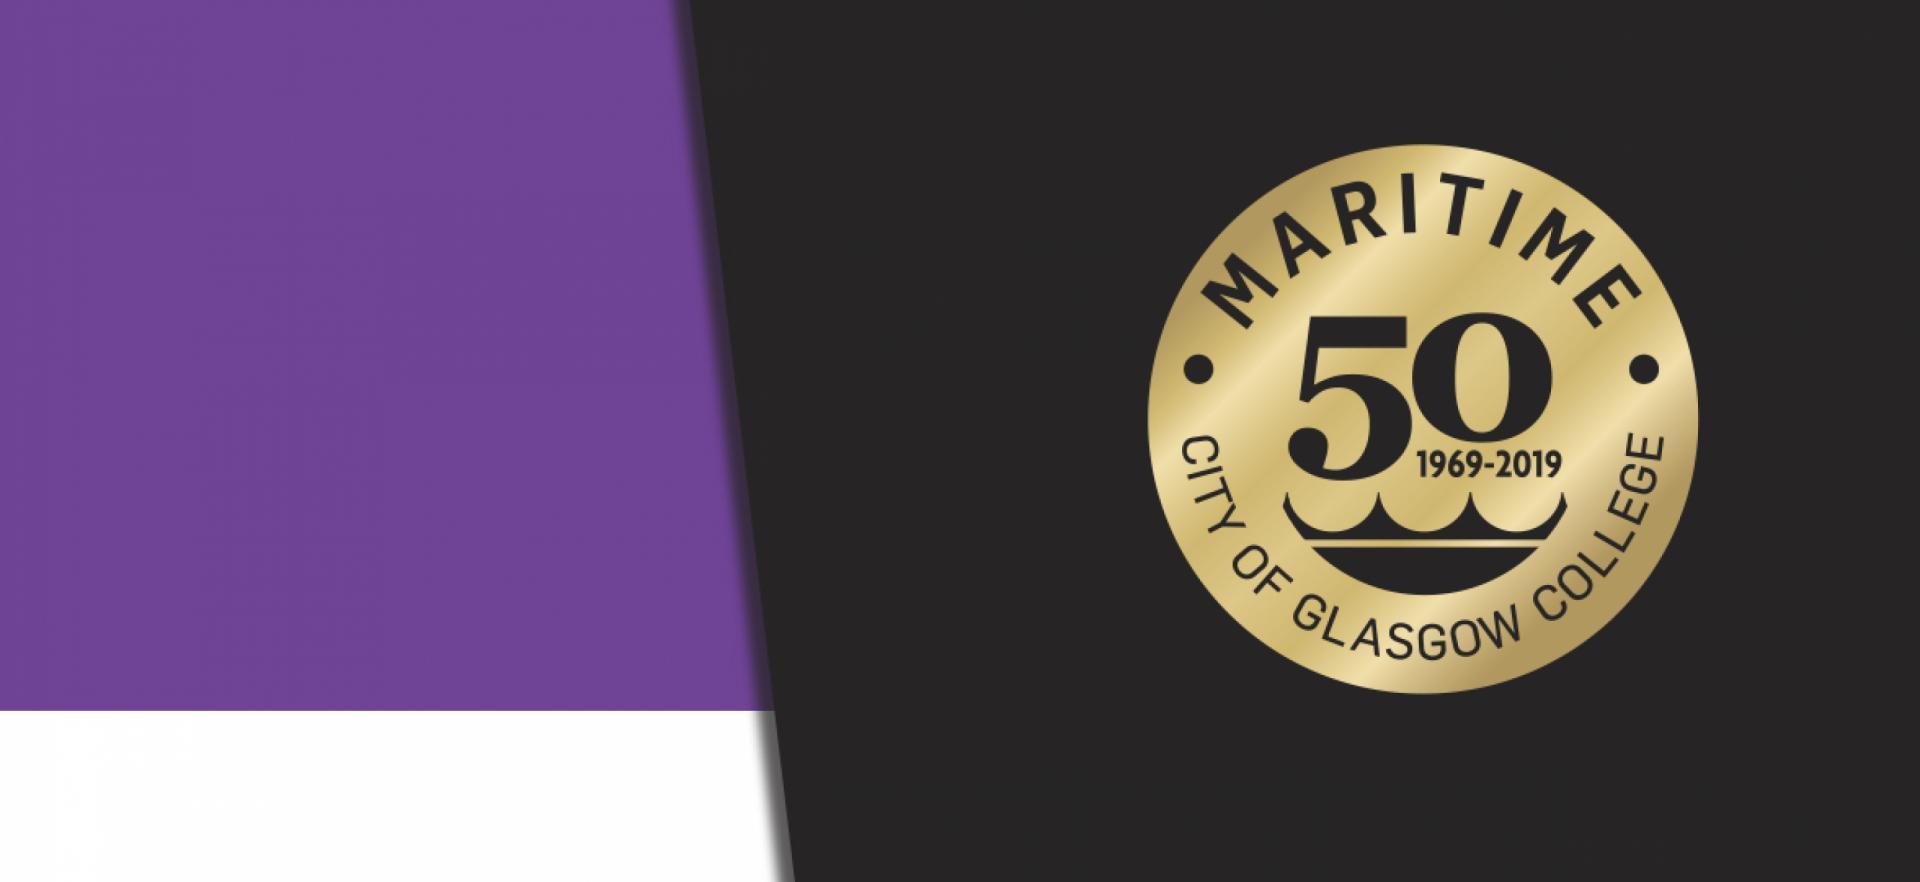 Maritime 50